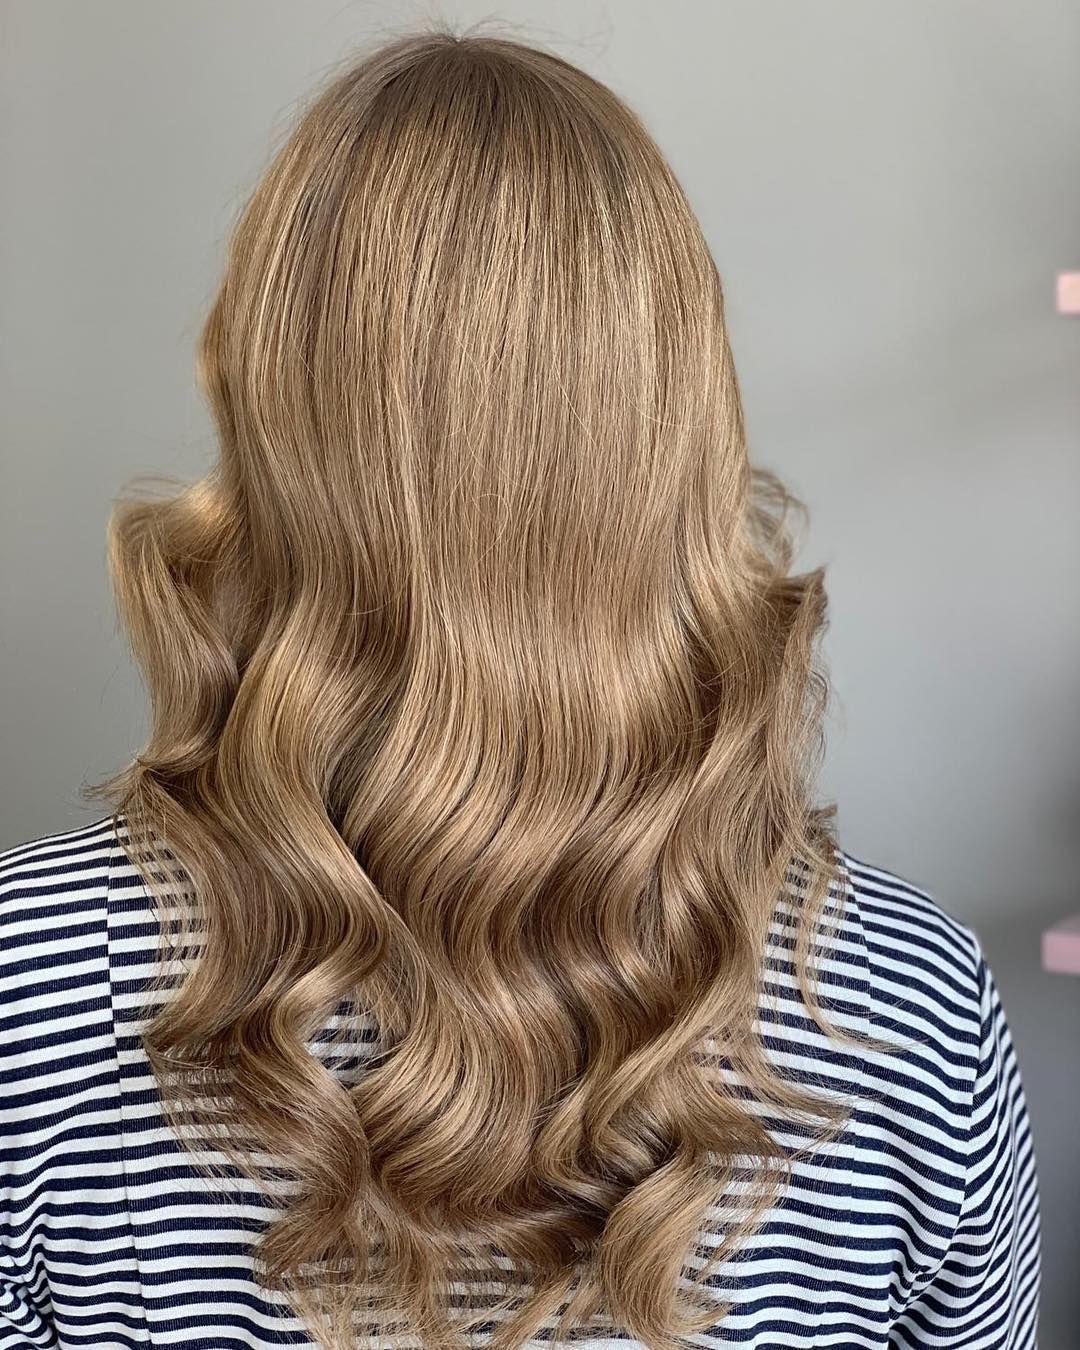 Friseur fur lange haare hamburg